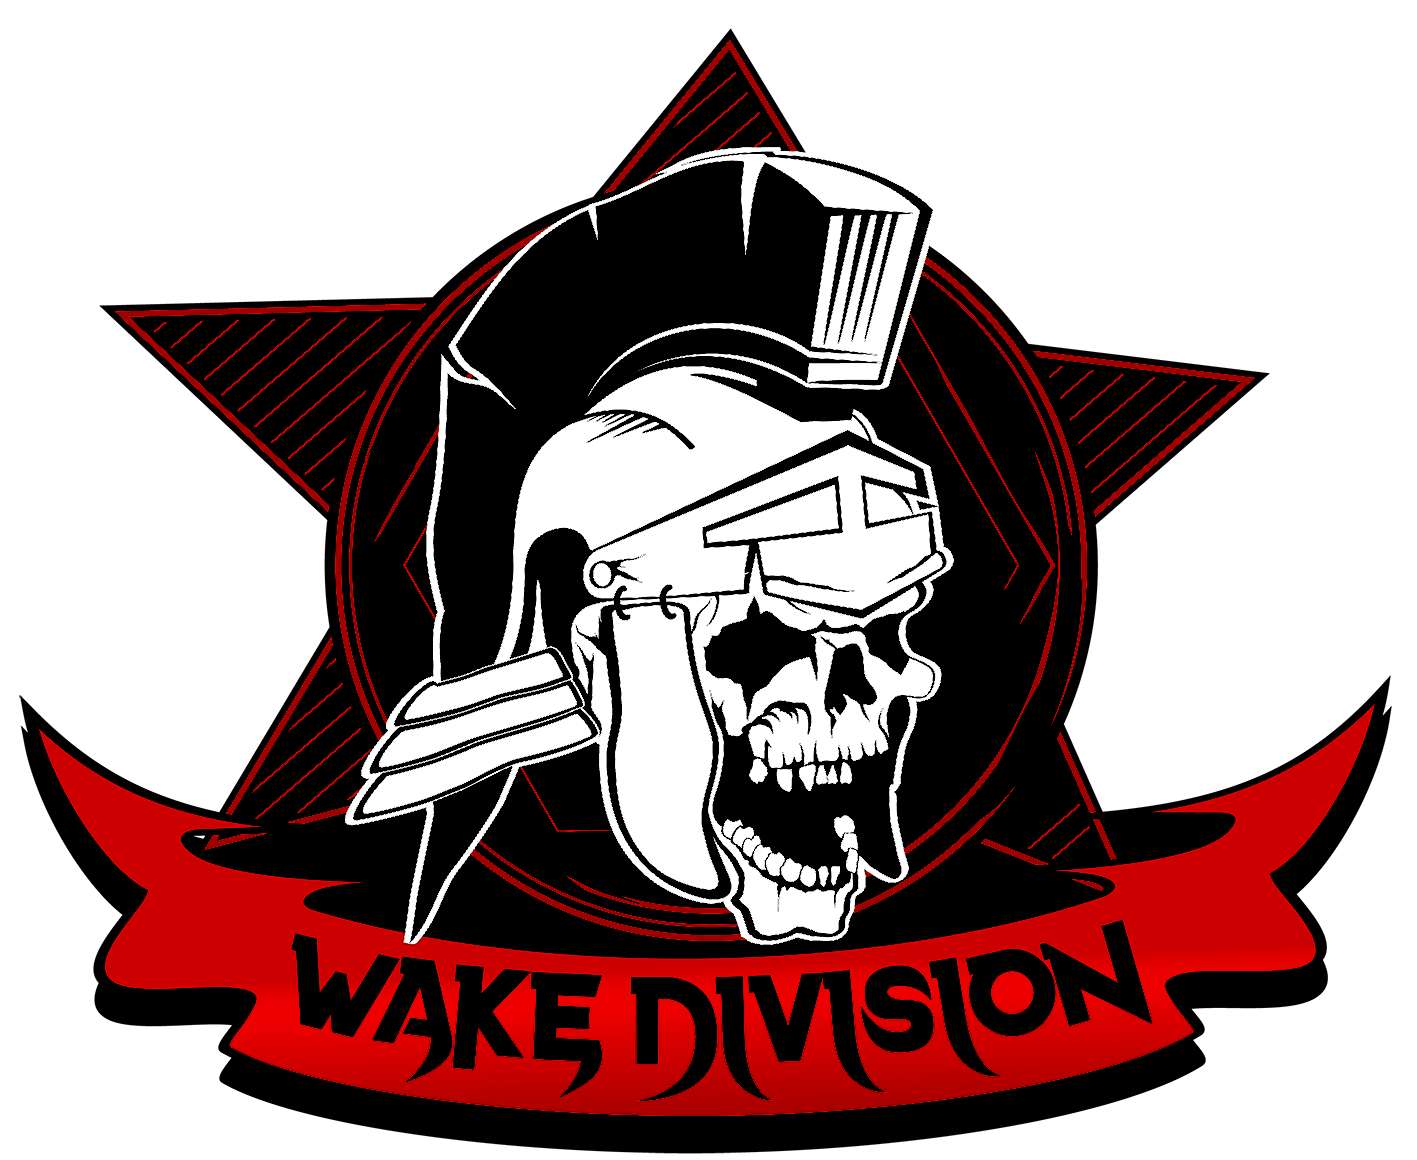 (c) Wakedivision.ru